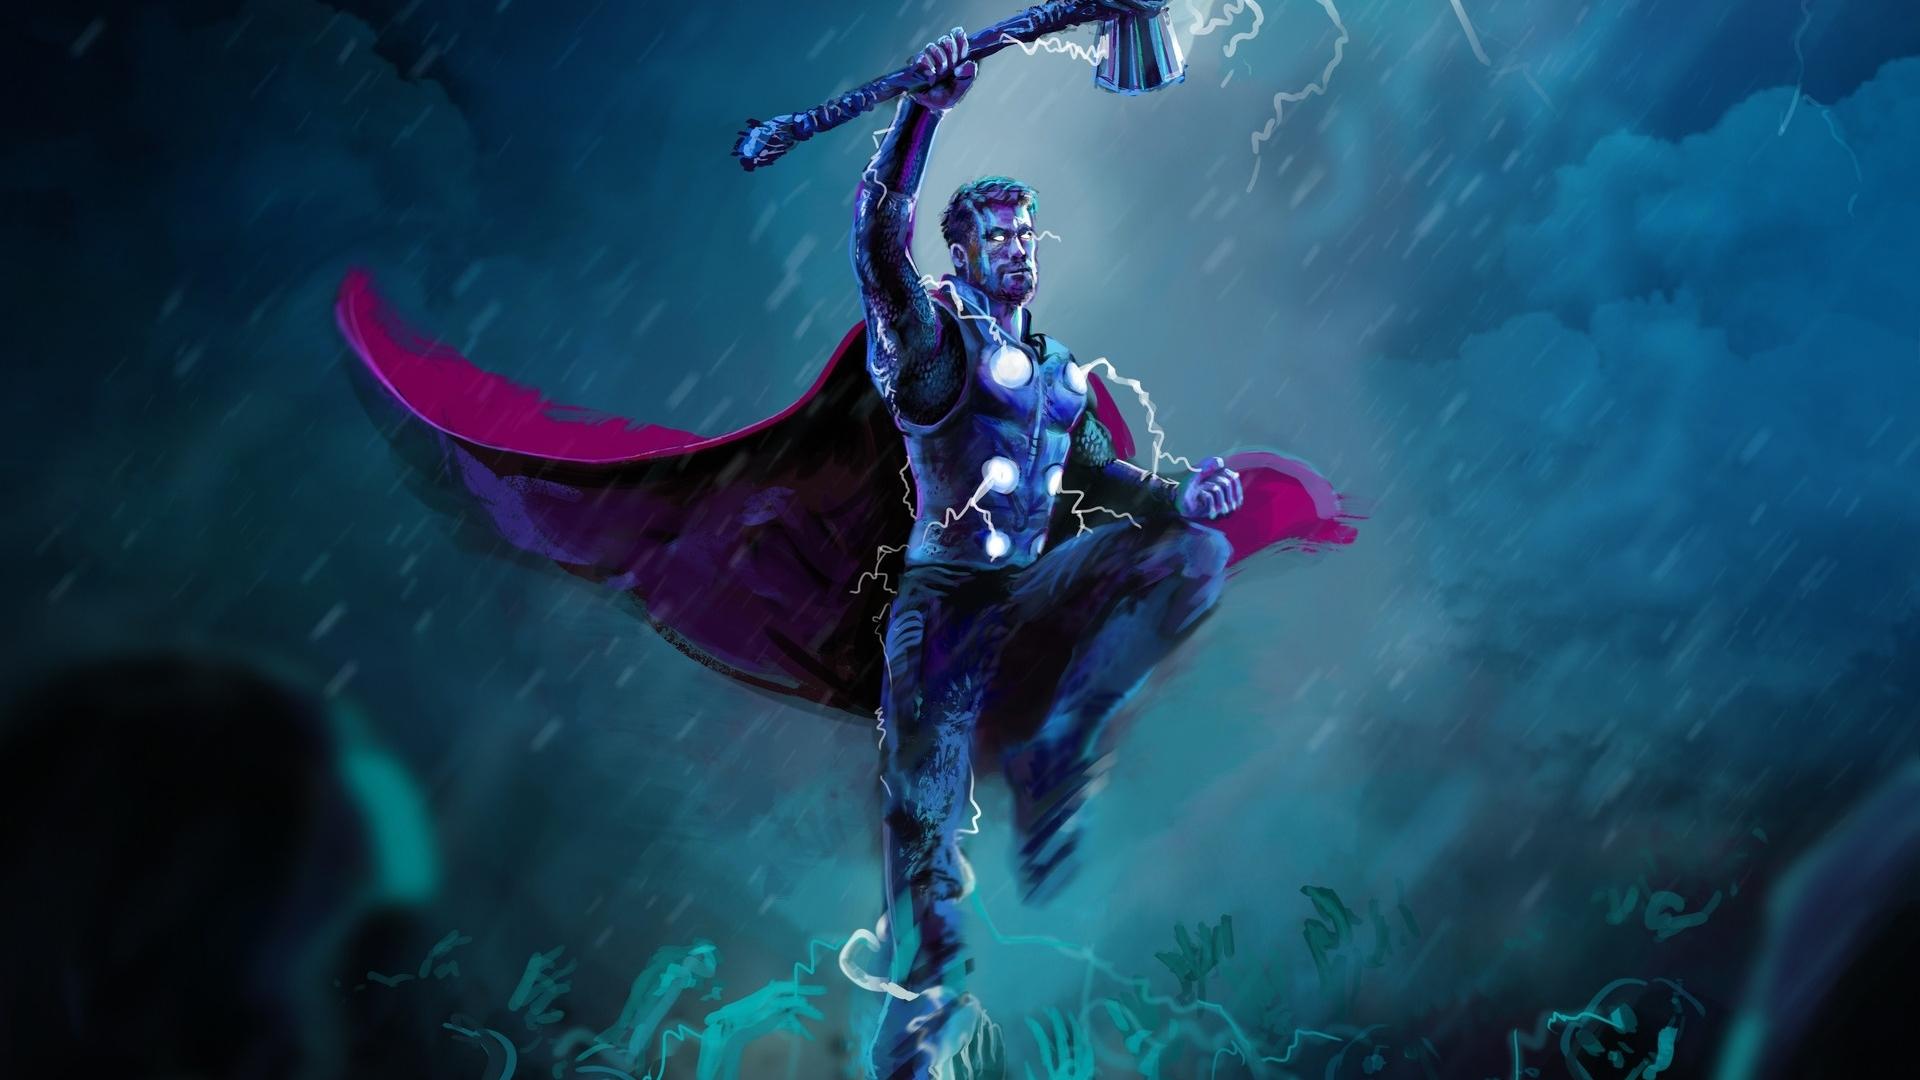 Download 1920x1080 Wallpaper Thor Thunder Storm Artwork